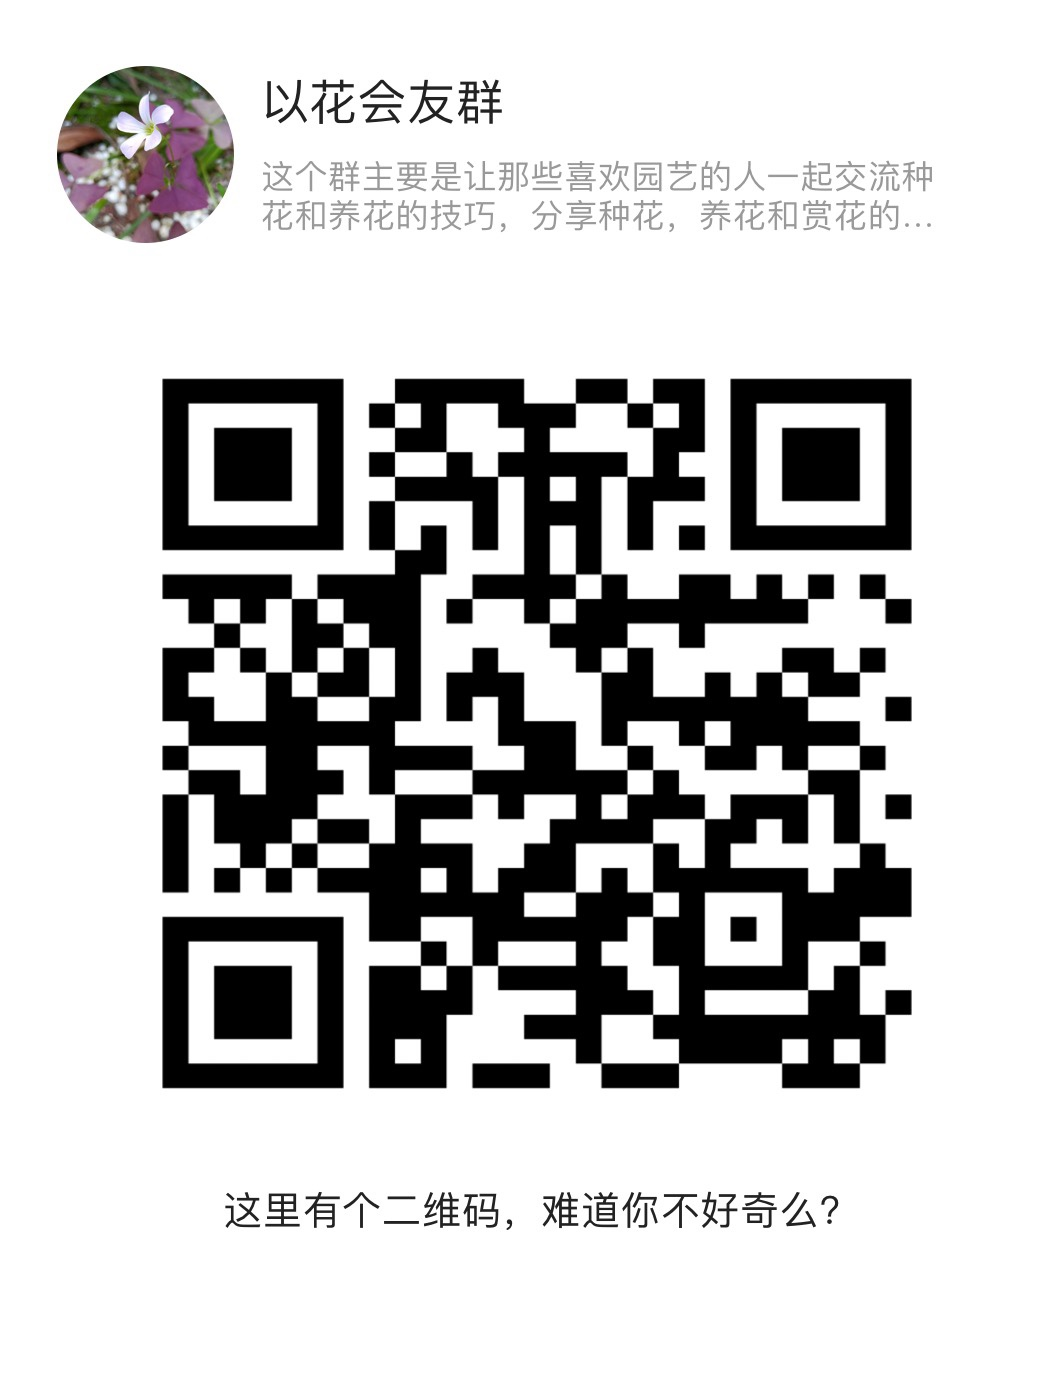 front1_0_Fnon5iXm_MAcaXw9rV_MnA0lTKCG.1624716496.jpg